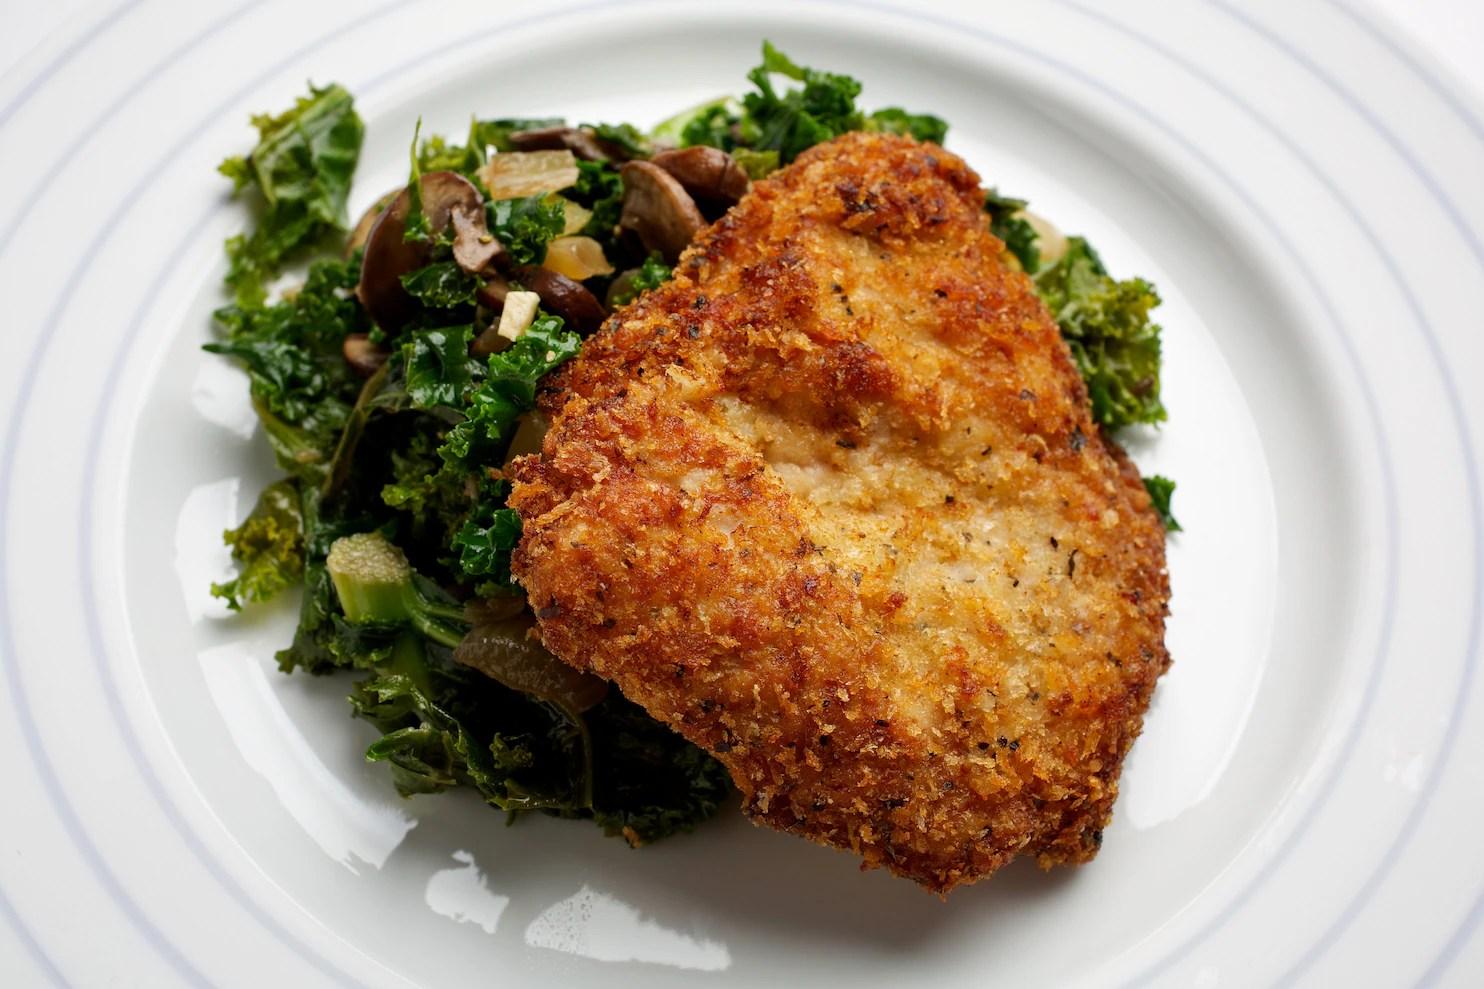 Turkey Deep Fry Pan